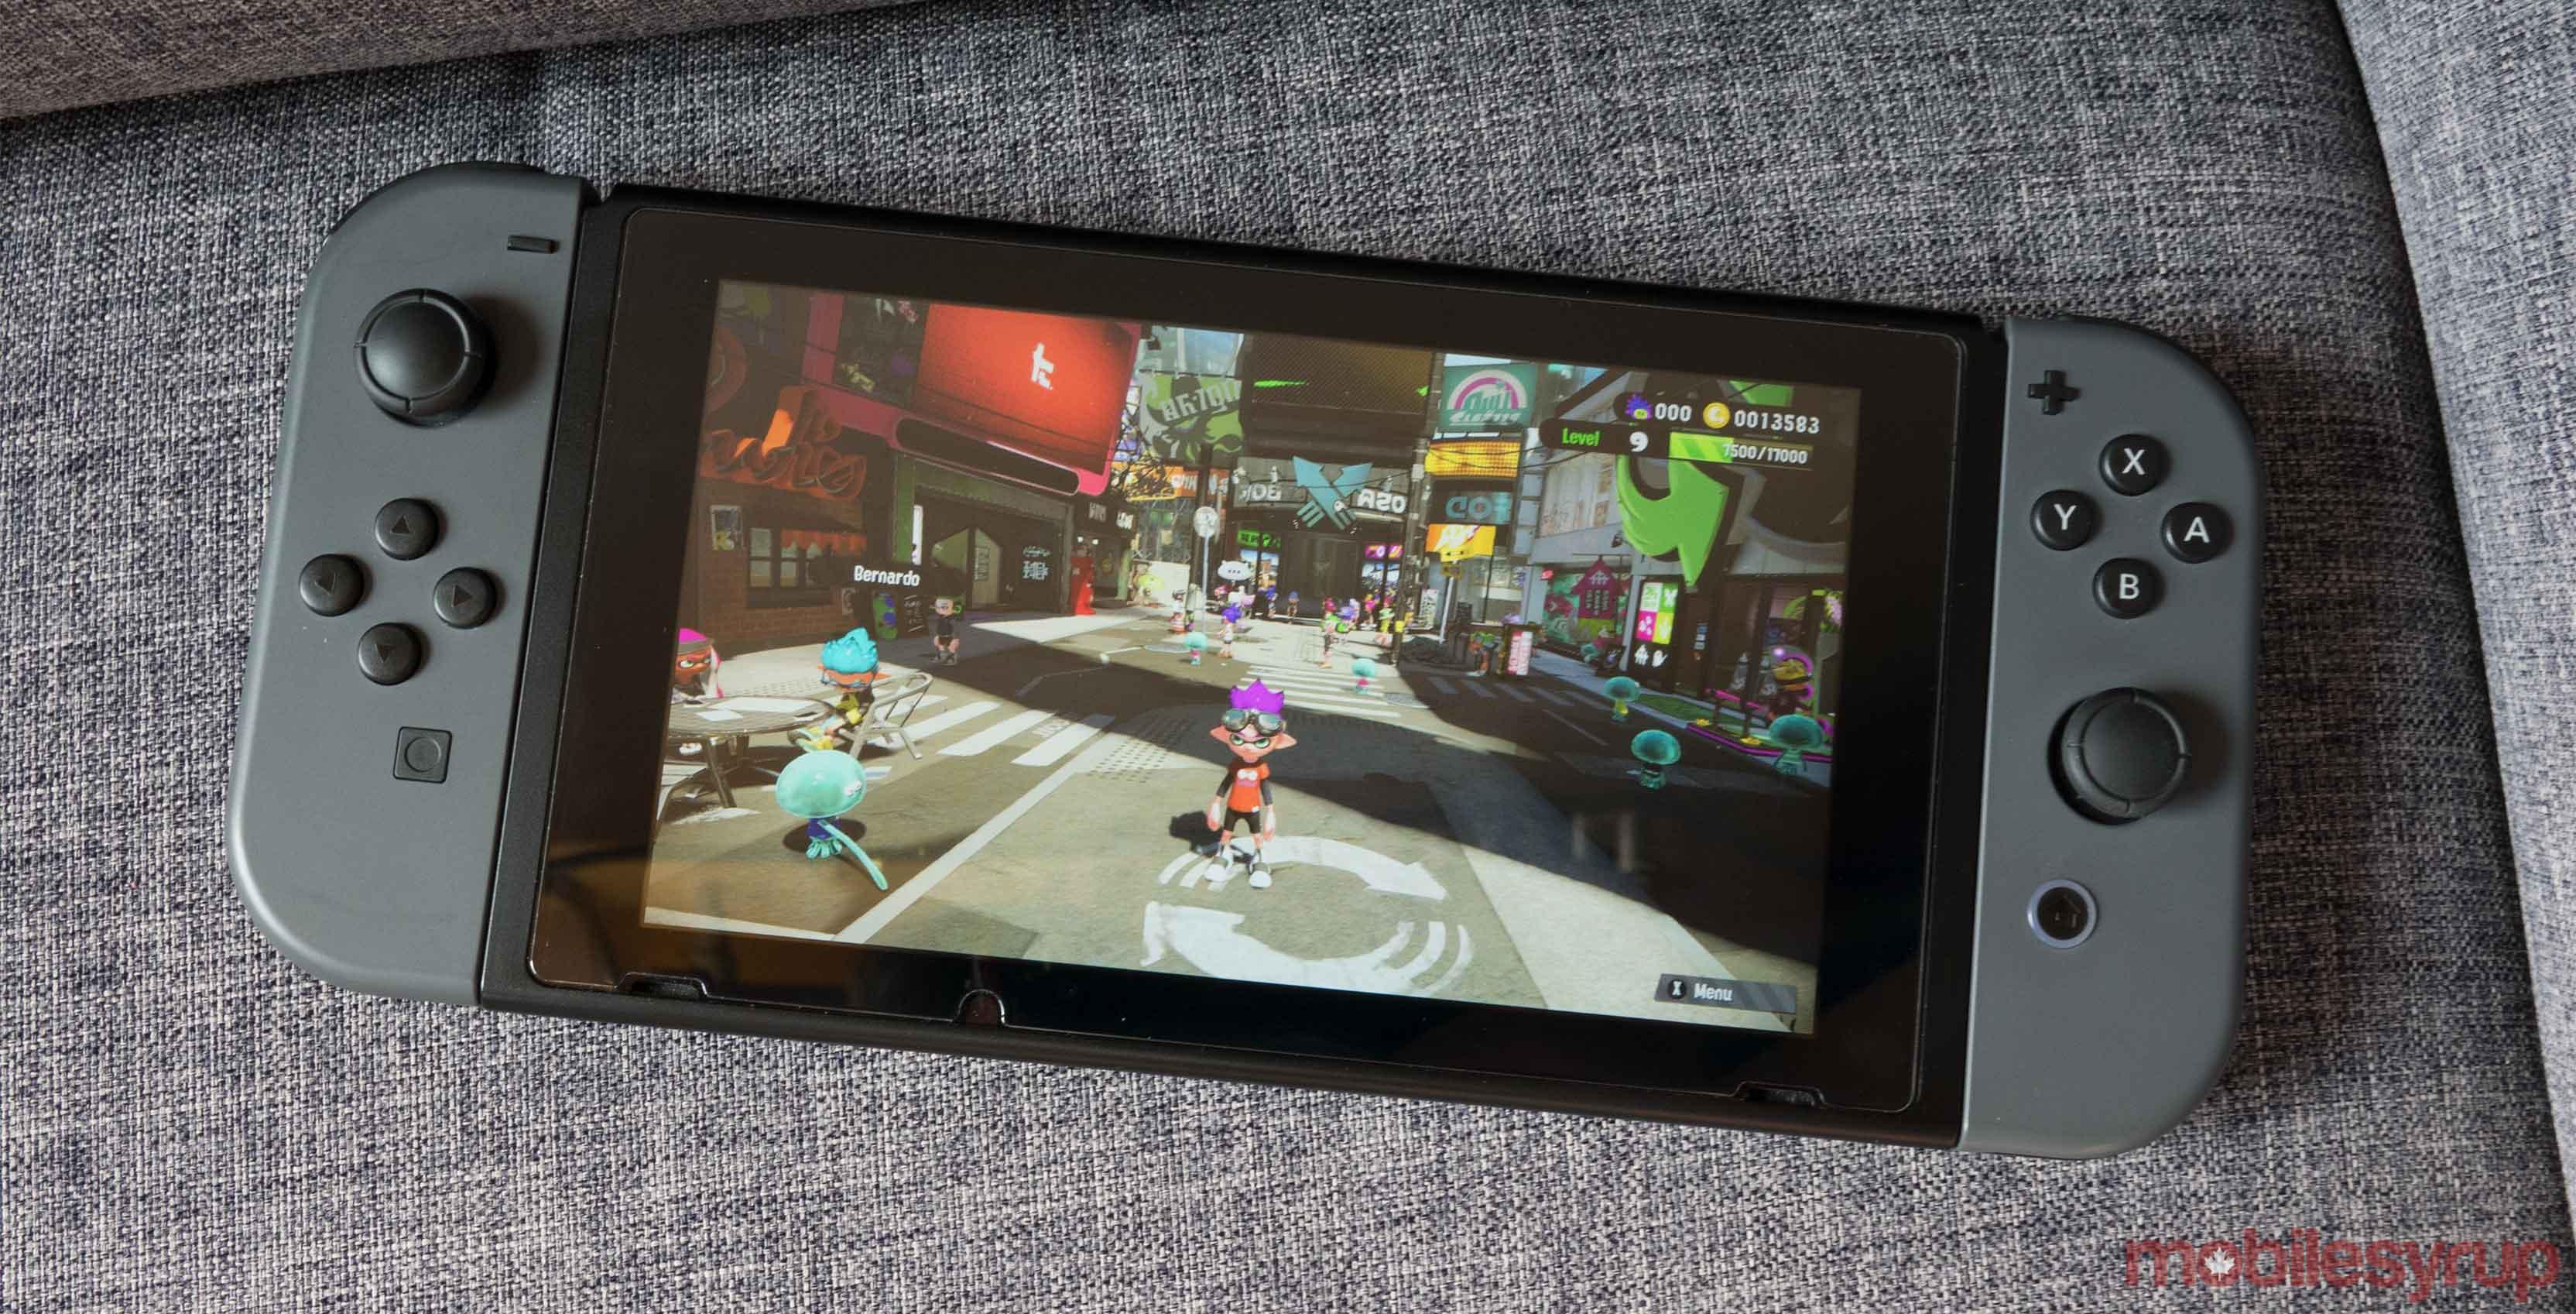 Nintendo Switch with Splatoon 2